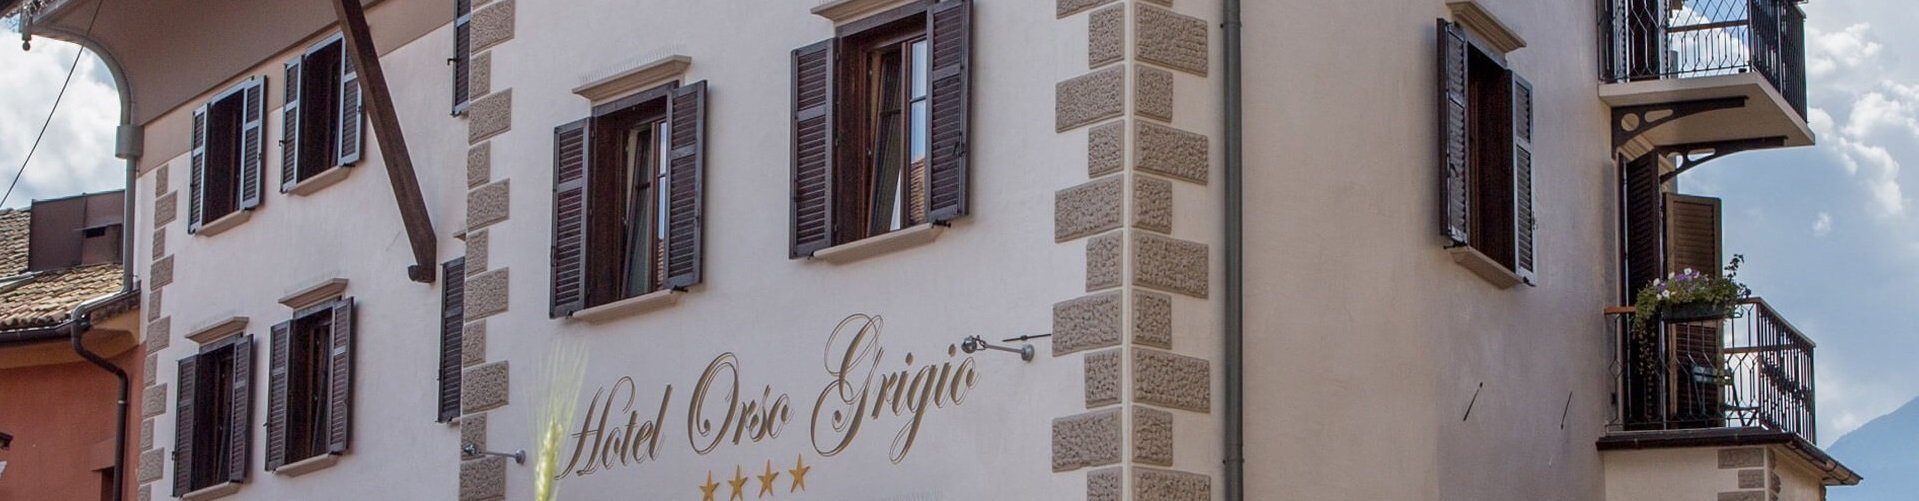 Banner foto Hotel Orso Grigio in Cavalese